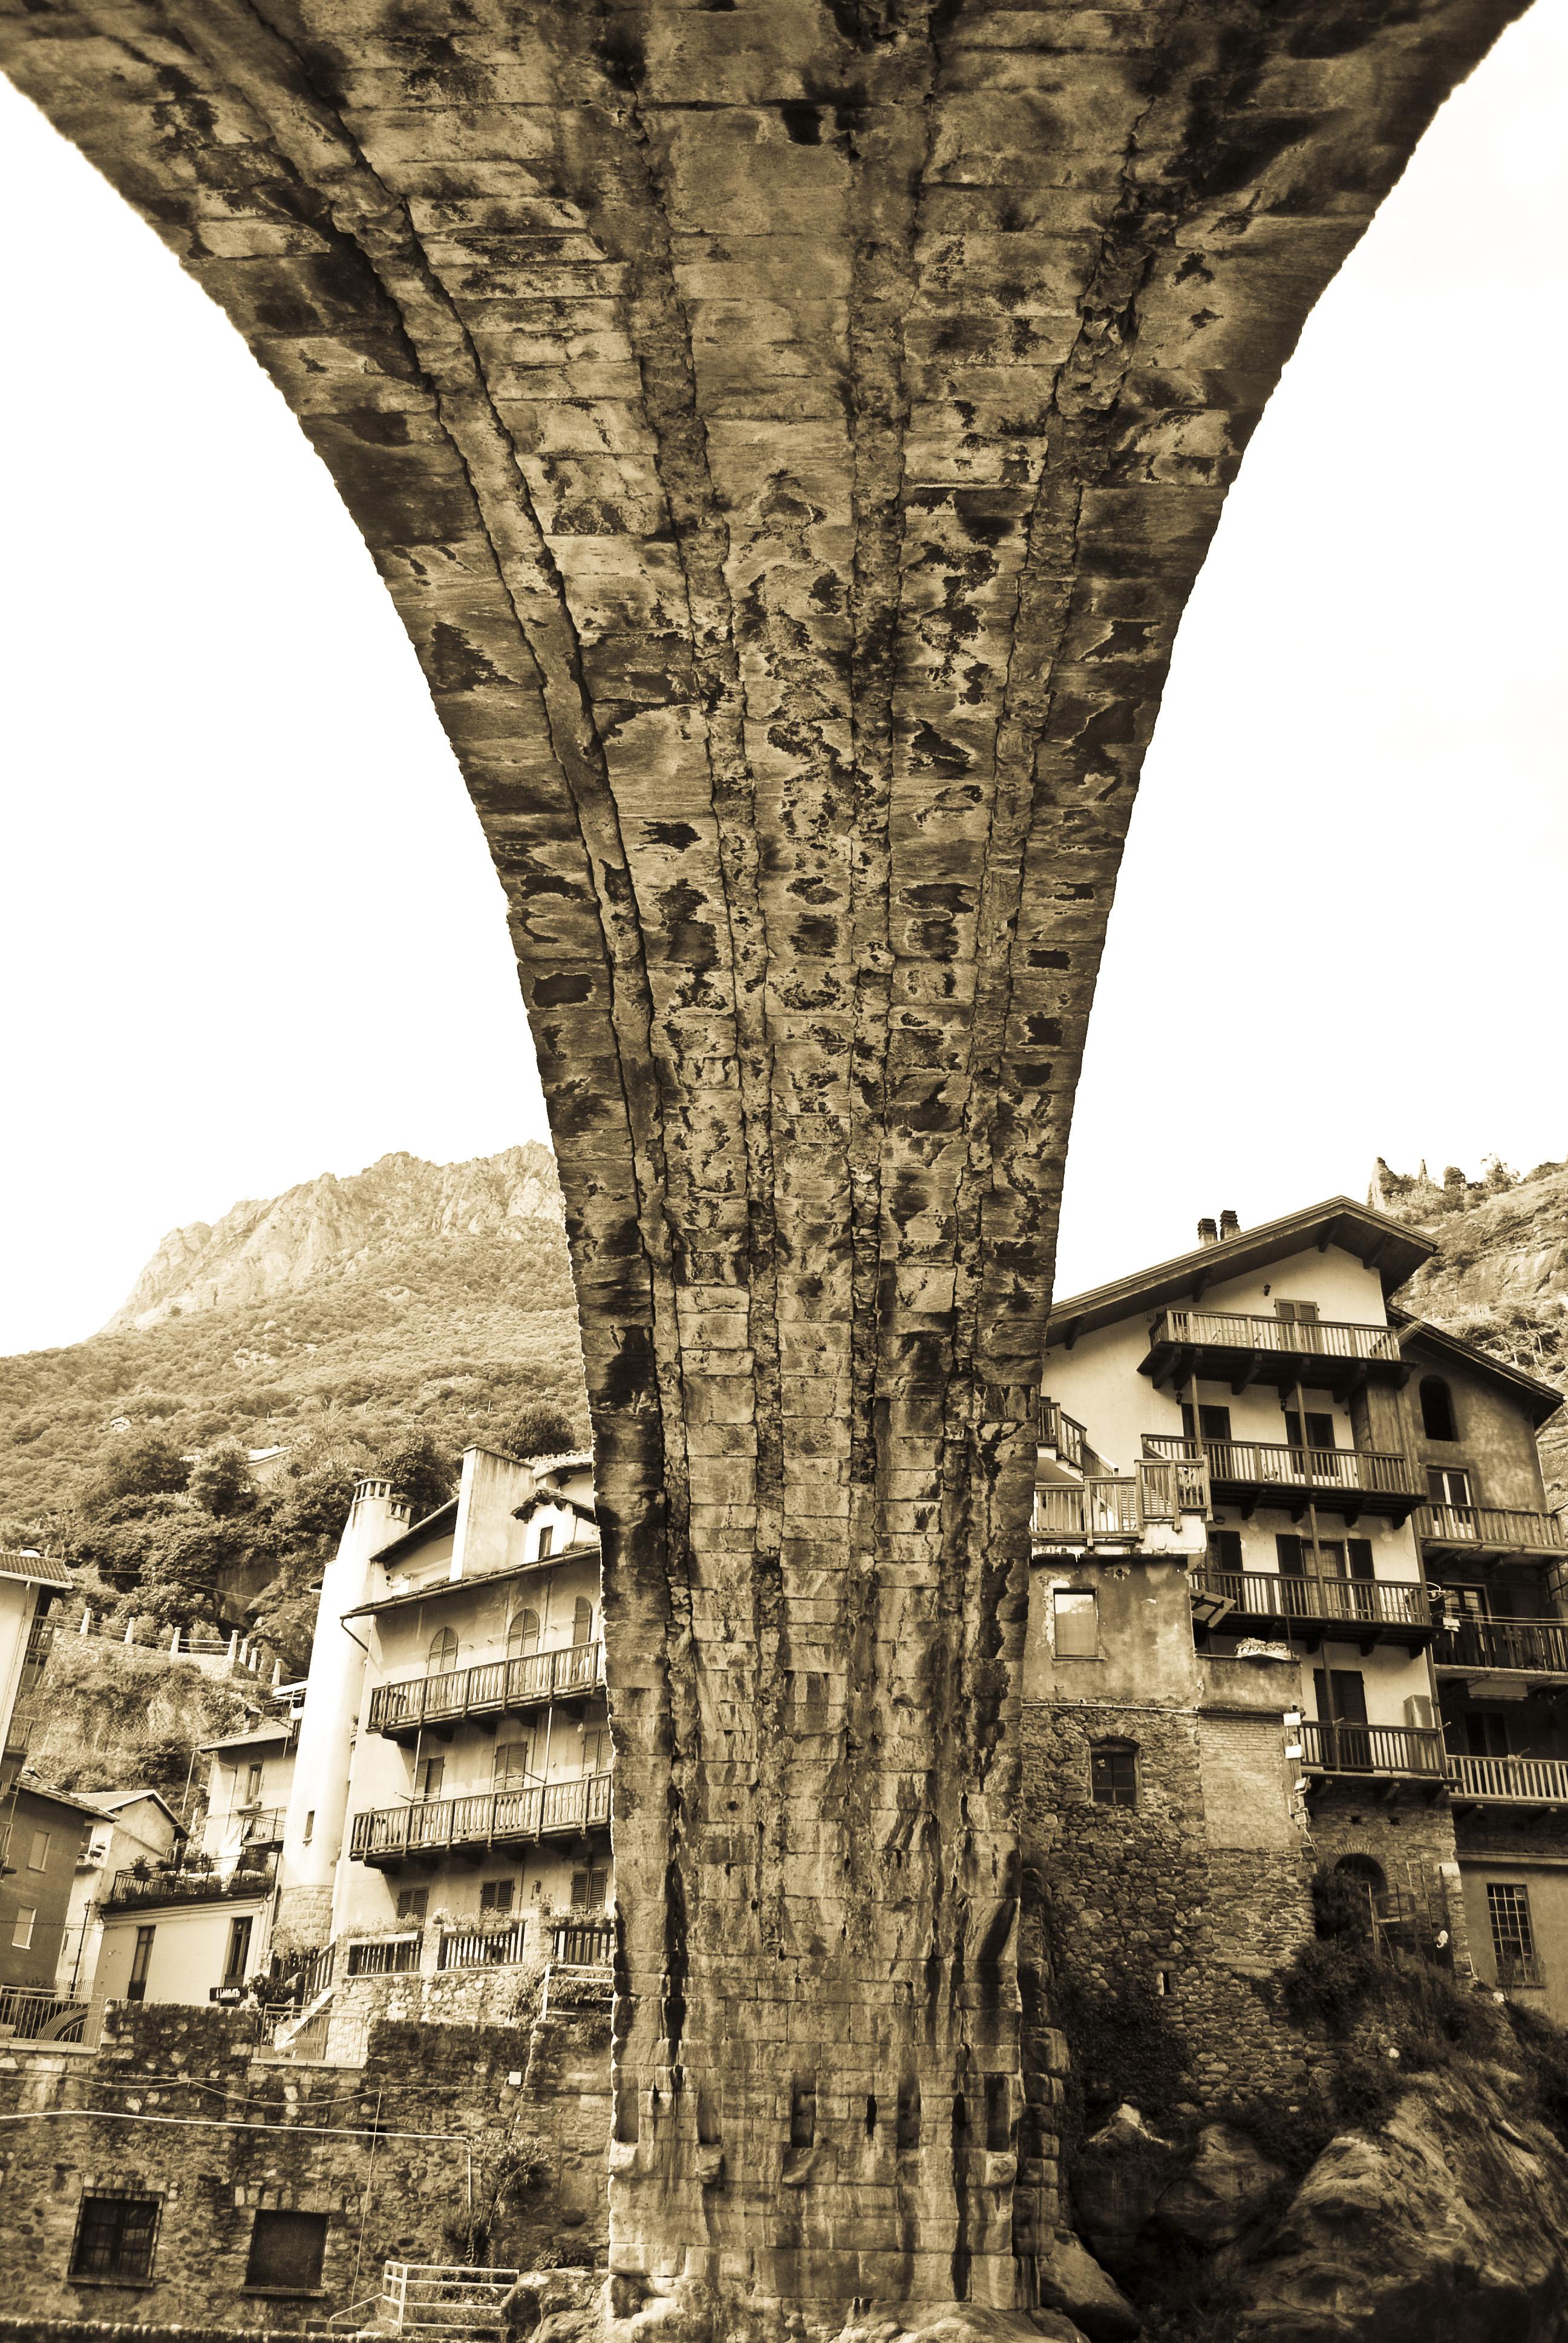 file pont saint martin bridge aosta valley italy pic wikipedia. Black Bedroom Furniture Sets. Home Design Ideas